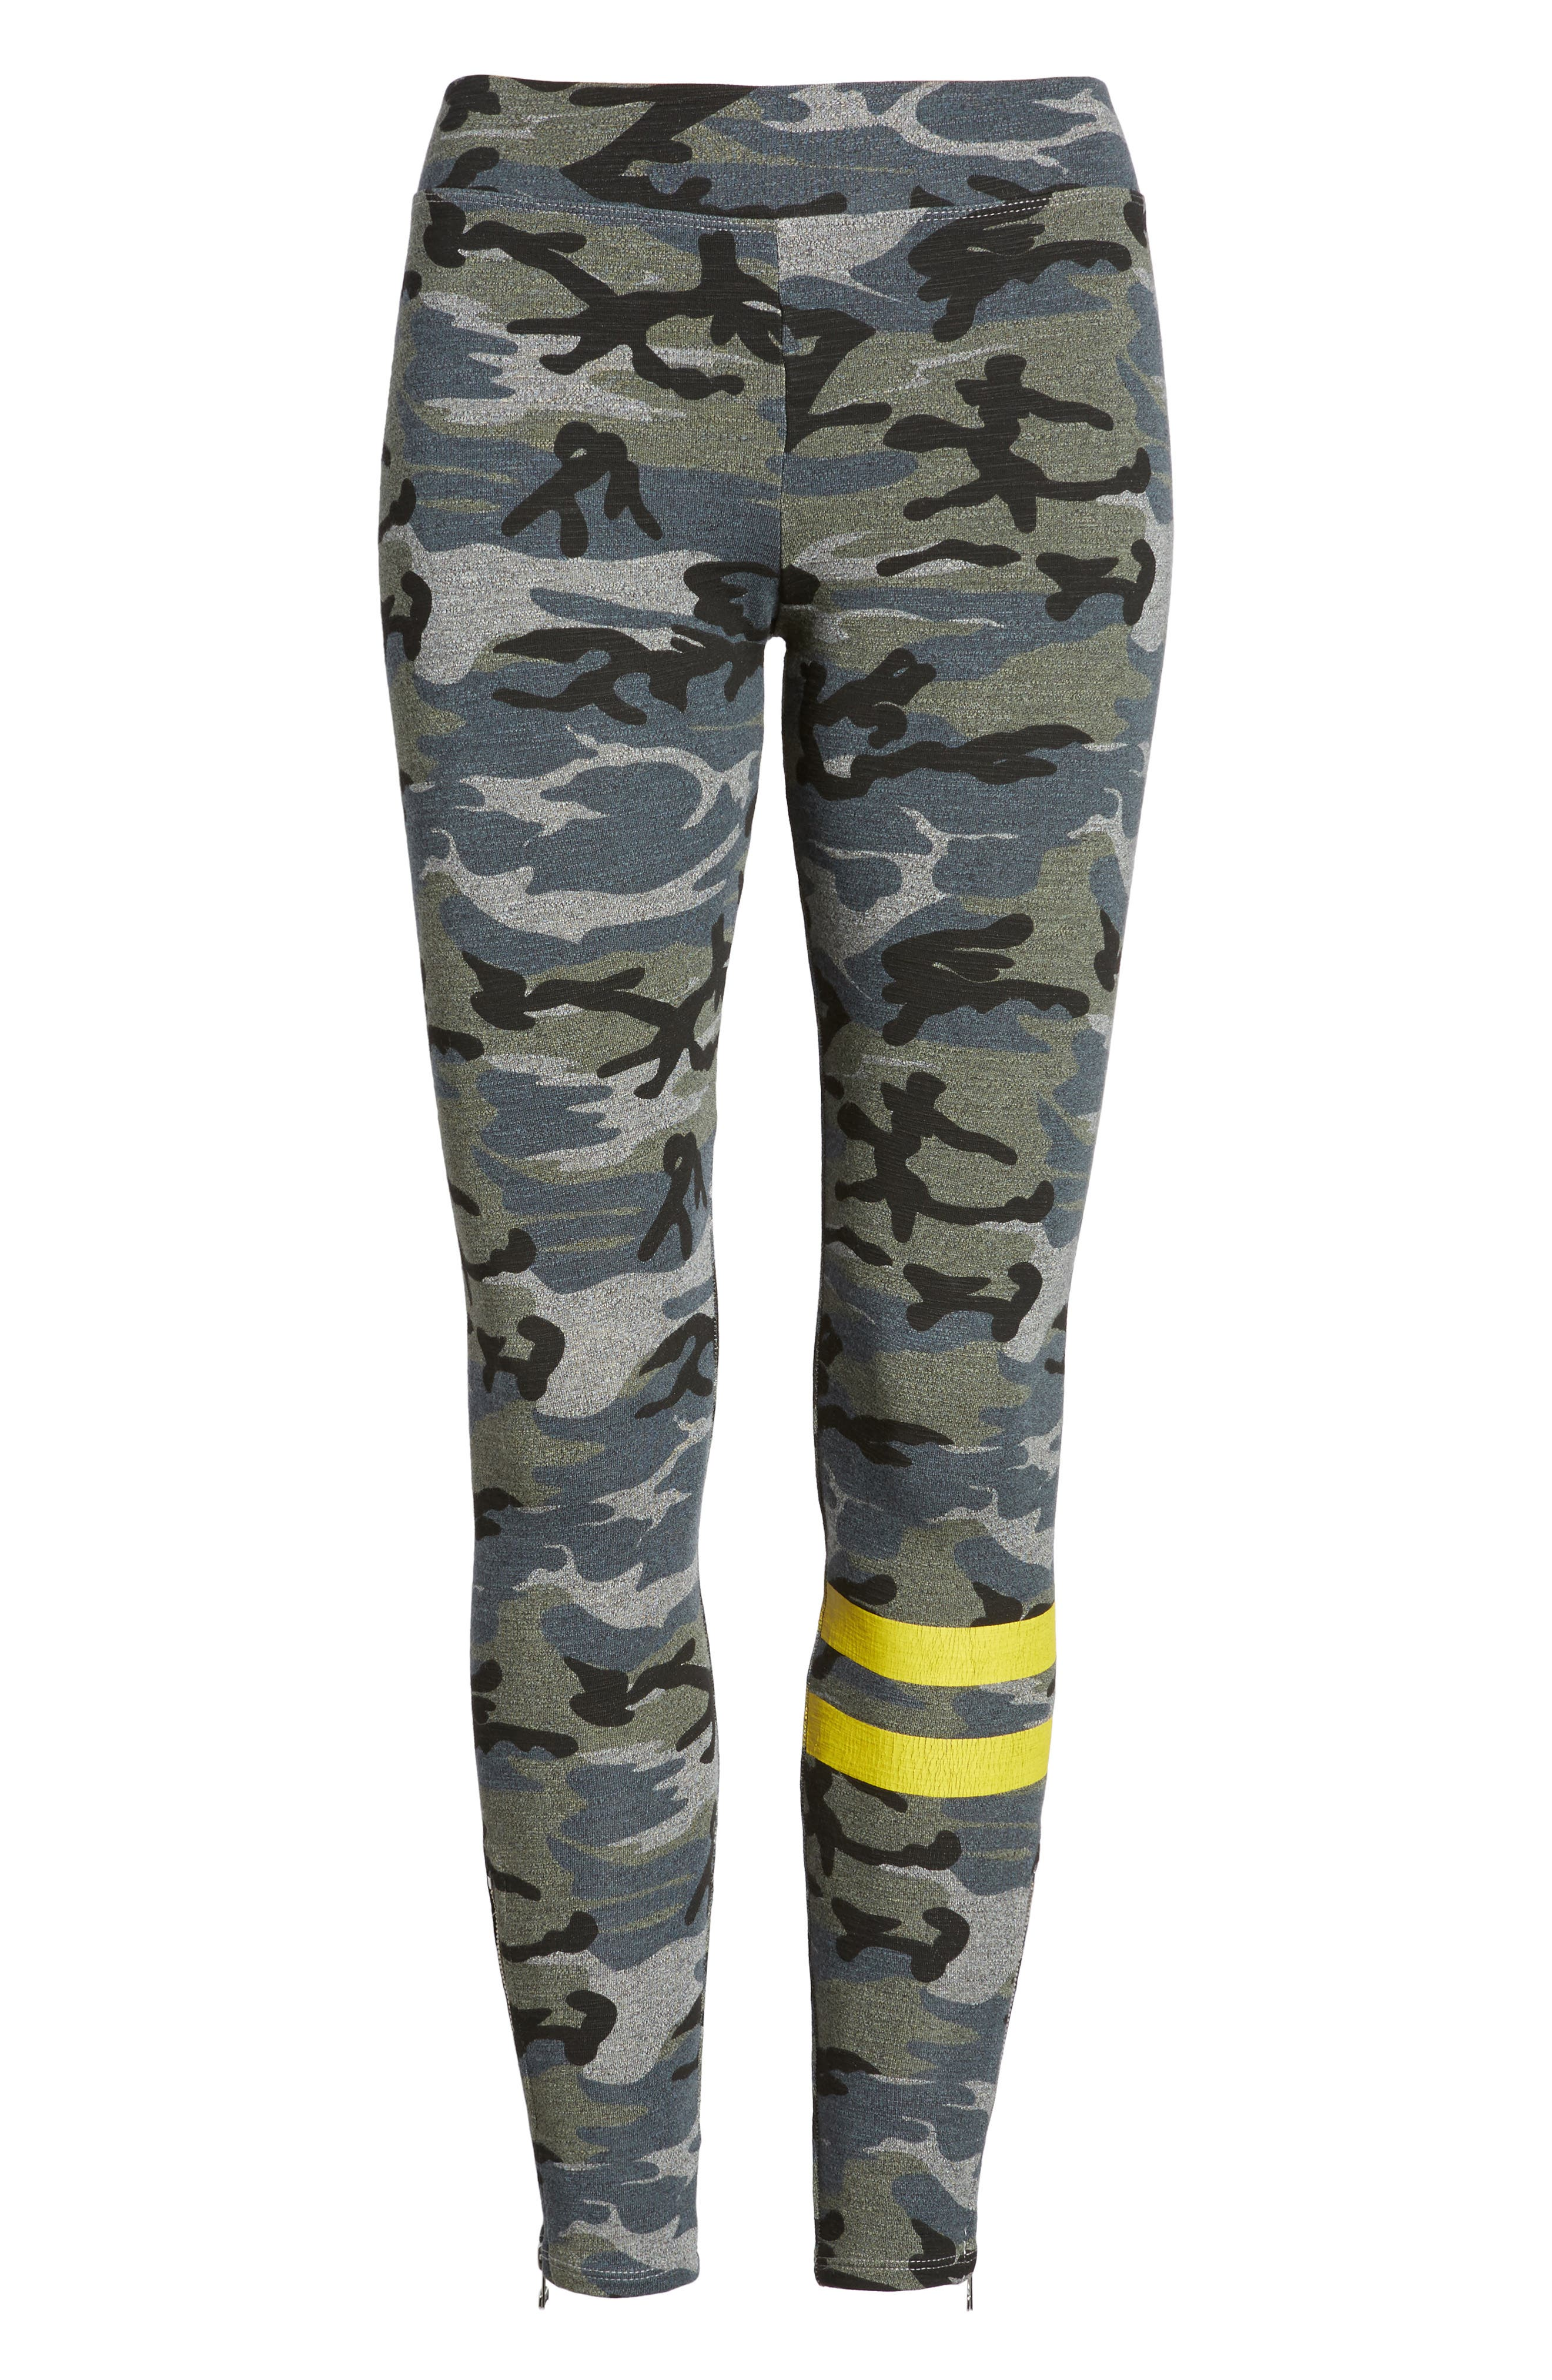 Stripe Camo Yoga Pants,                             Alternate thumbnail 7, color,                             020